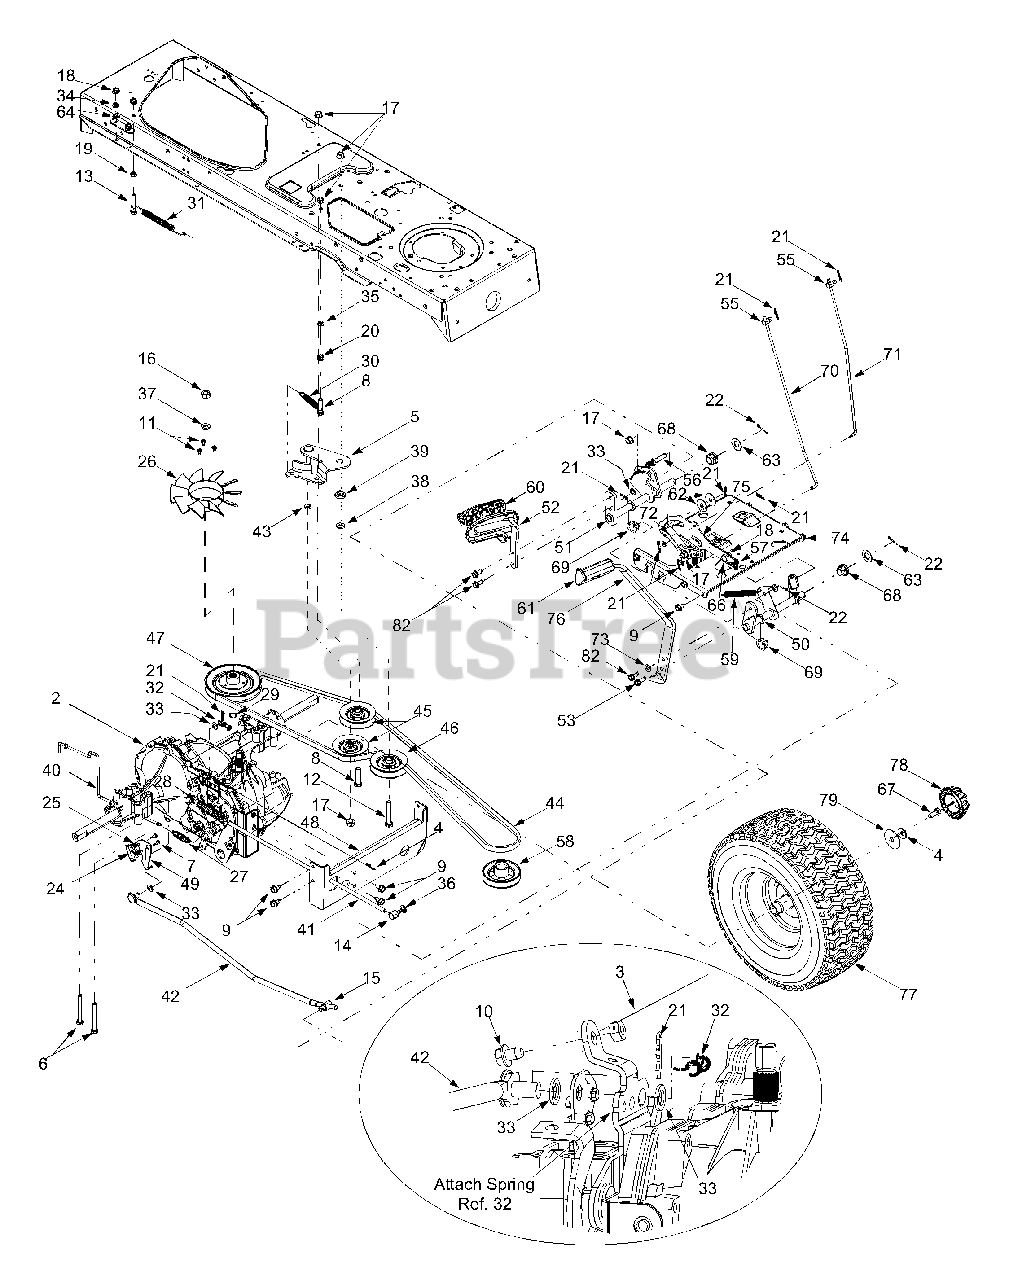 Yard-man Parts On The Drive  U0026 Rear Wheels Diagram For 13cx614g401